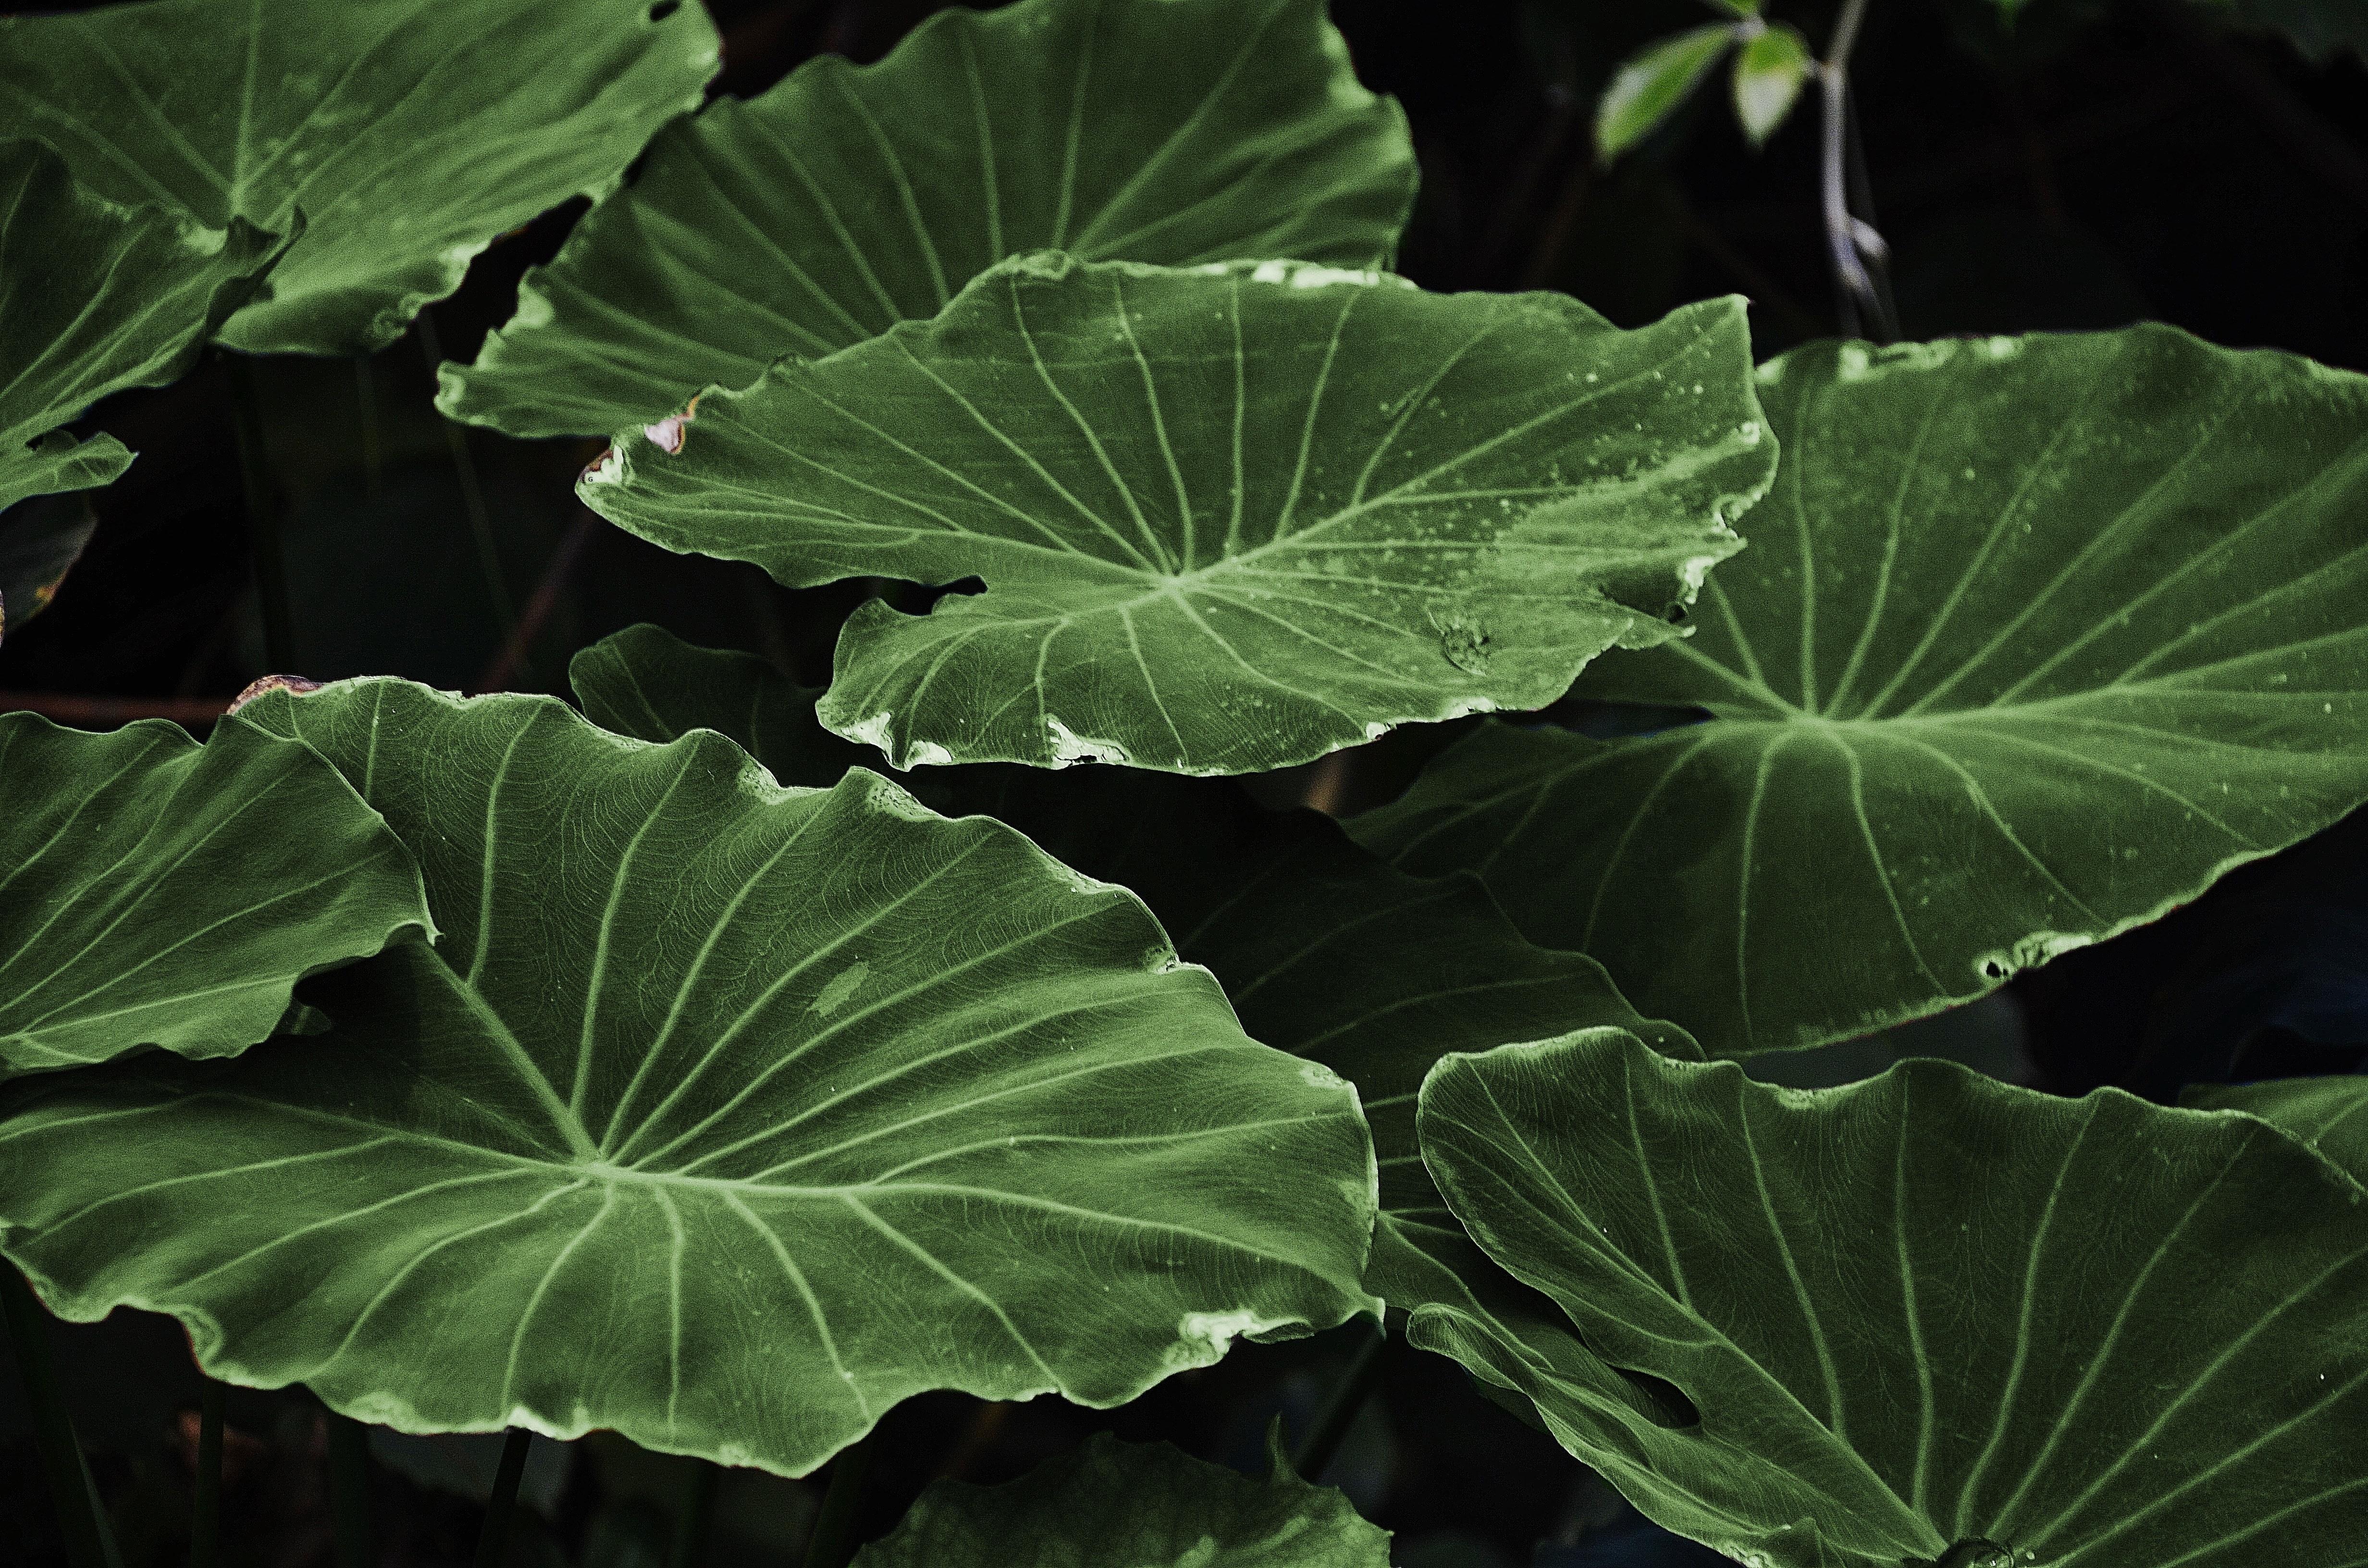 Green Heart Shape Leaf, Green, Leaves, Nature, Plant, HQ Photo